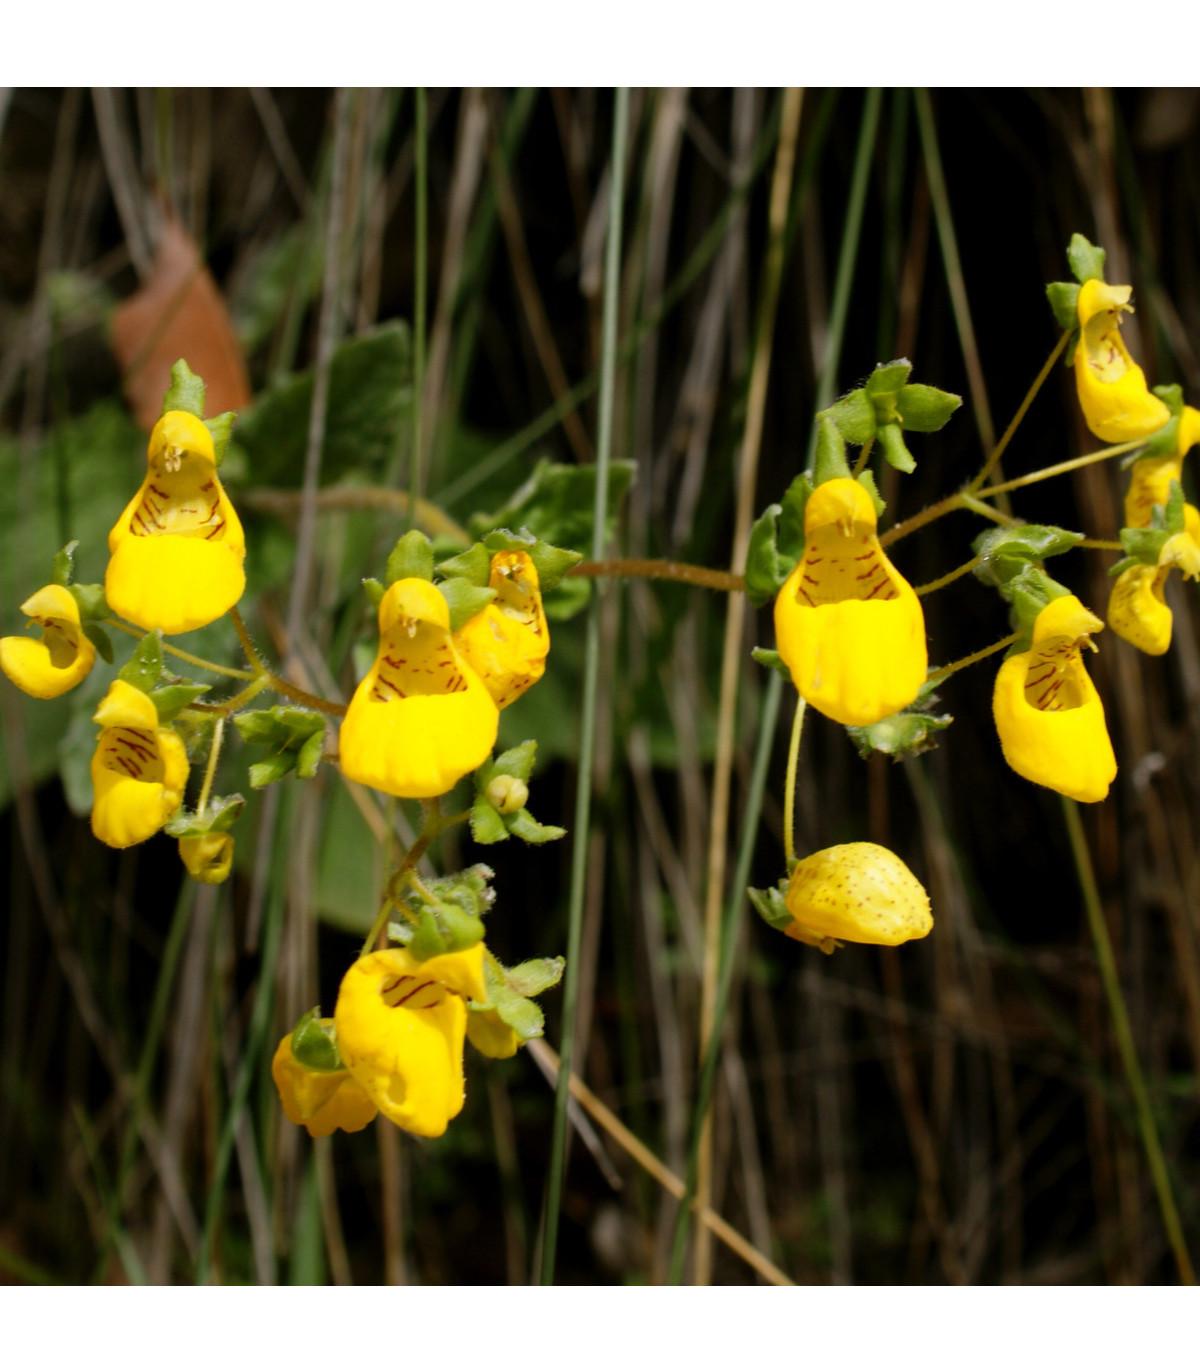 Pantoflíček celolistý - Calceolaria Andina - osivo pantoflíčku - 5 ks